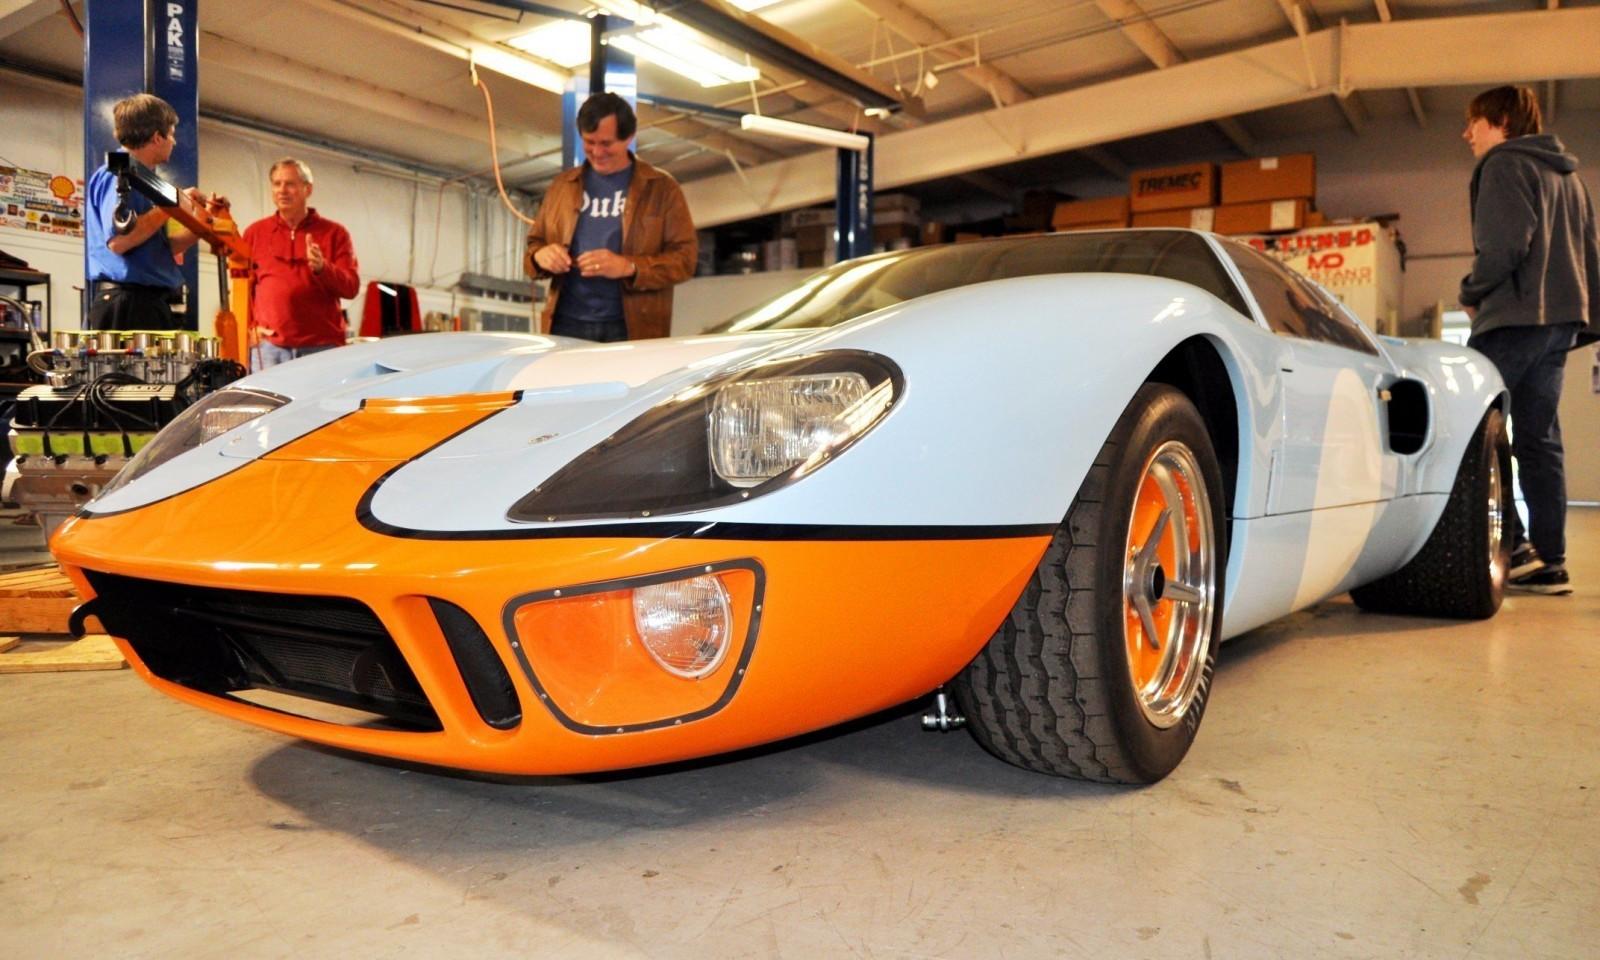 2014 Superformance GT40 Mark I - MEGA Photo Shoot and Ride-Along Videos 6